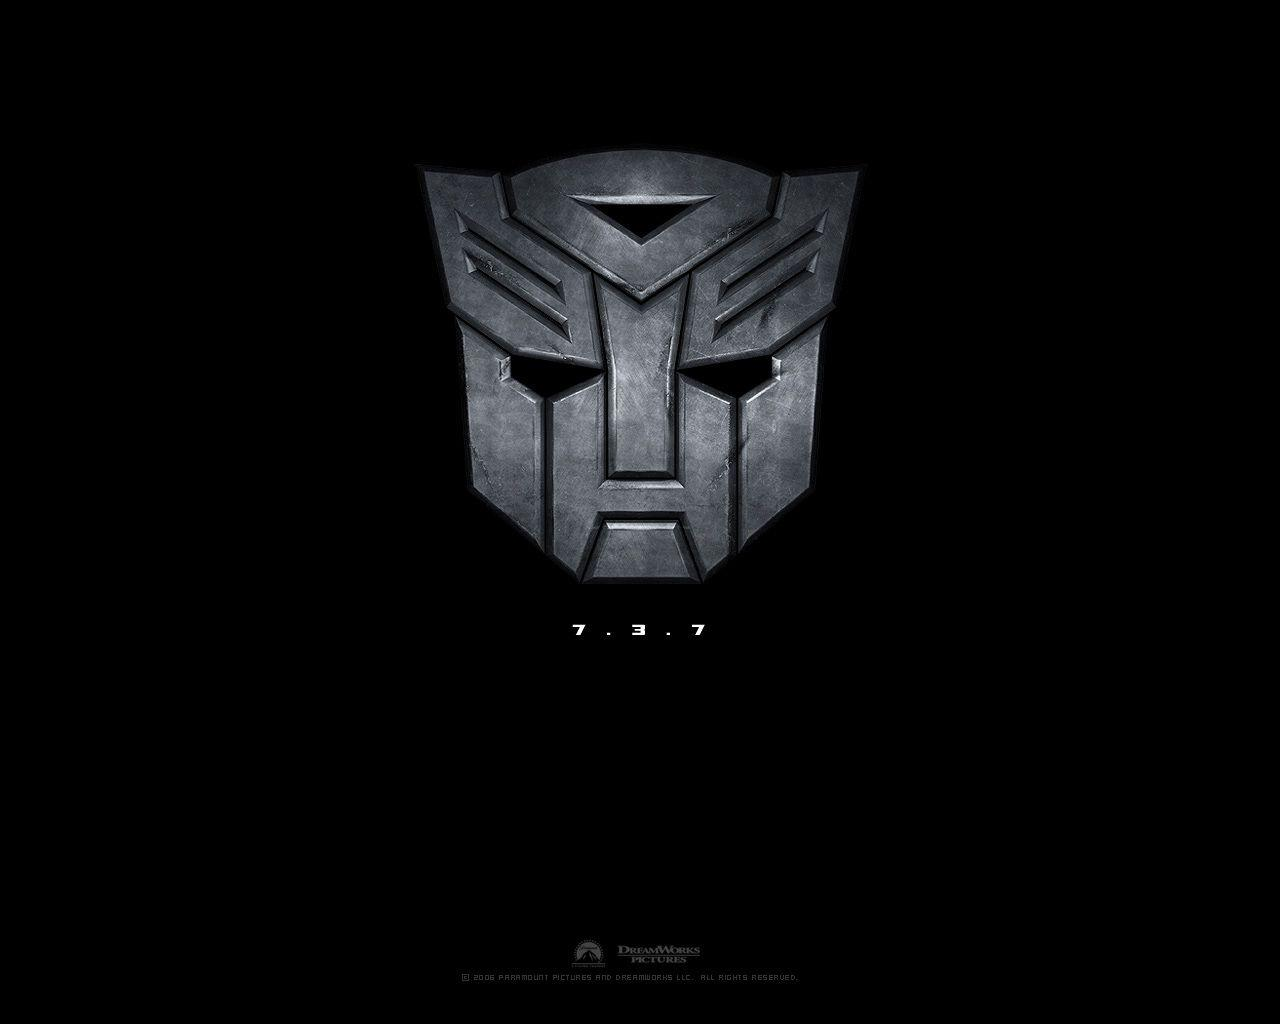 HD Transformers Wallpaper Best Transformers Wallpapers in High